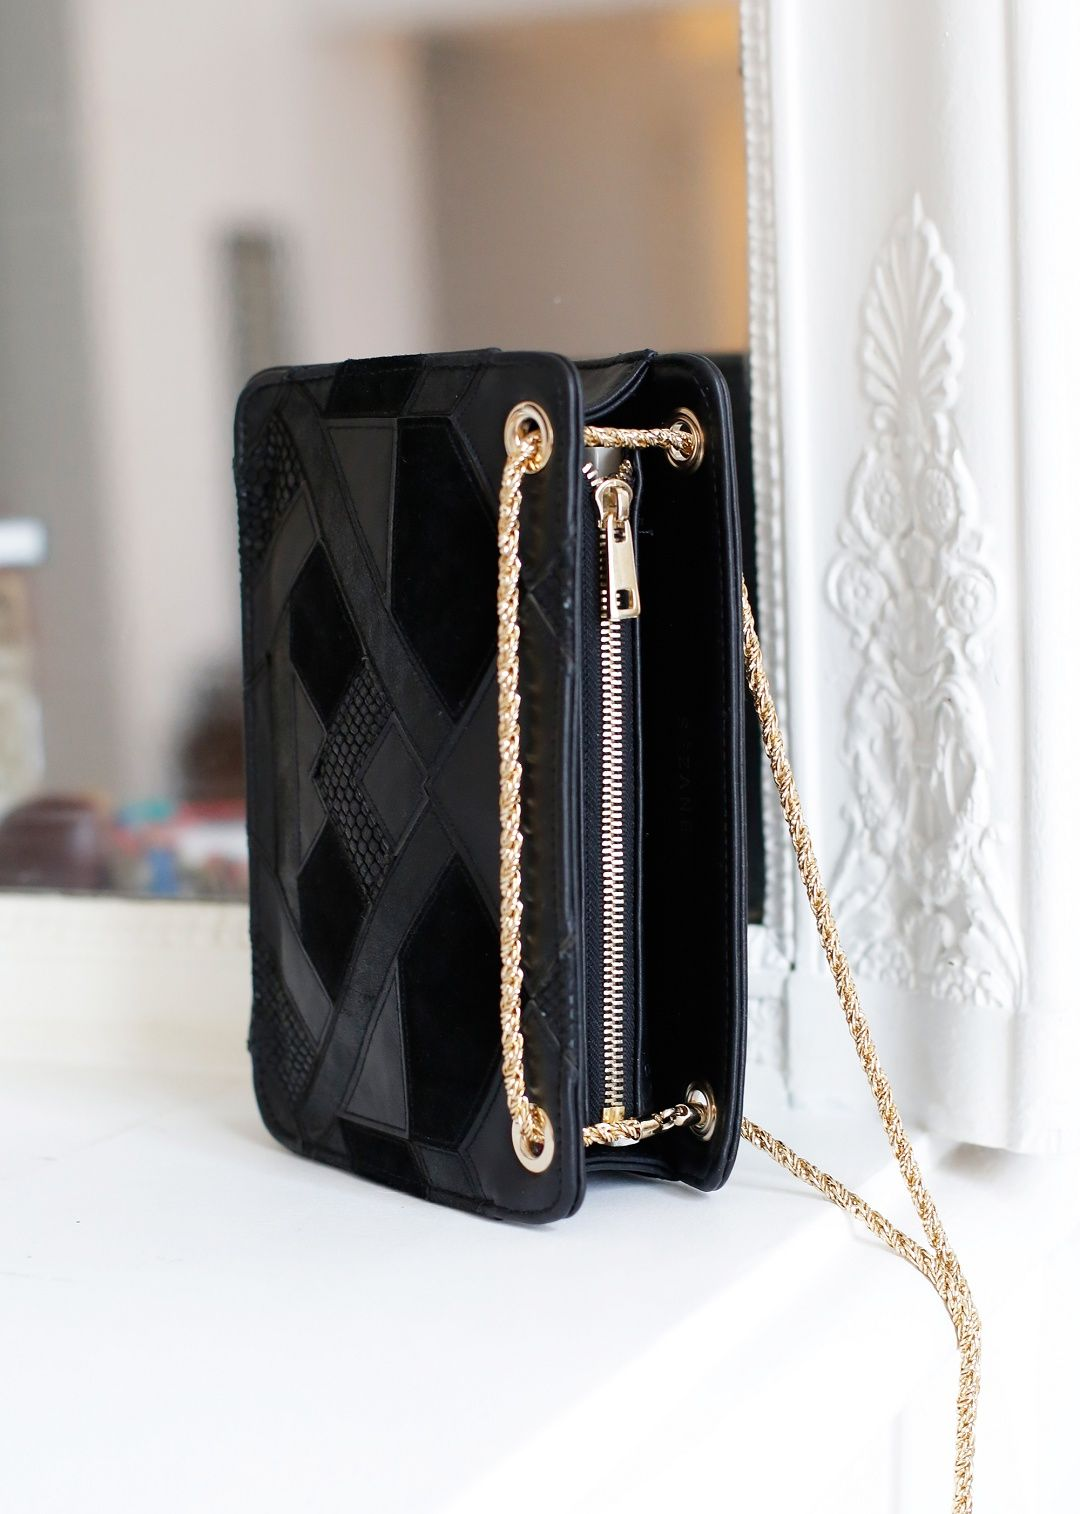 Bevorzugt sezane belli bag - Google Search | Fashion//haute couture | Pinterest EY04